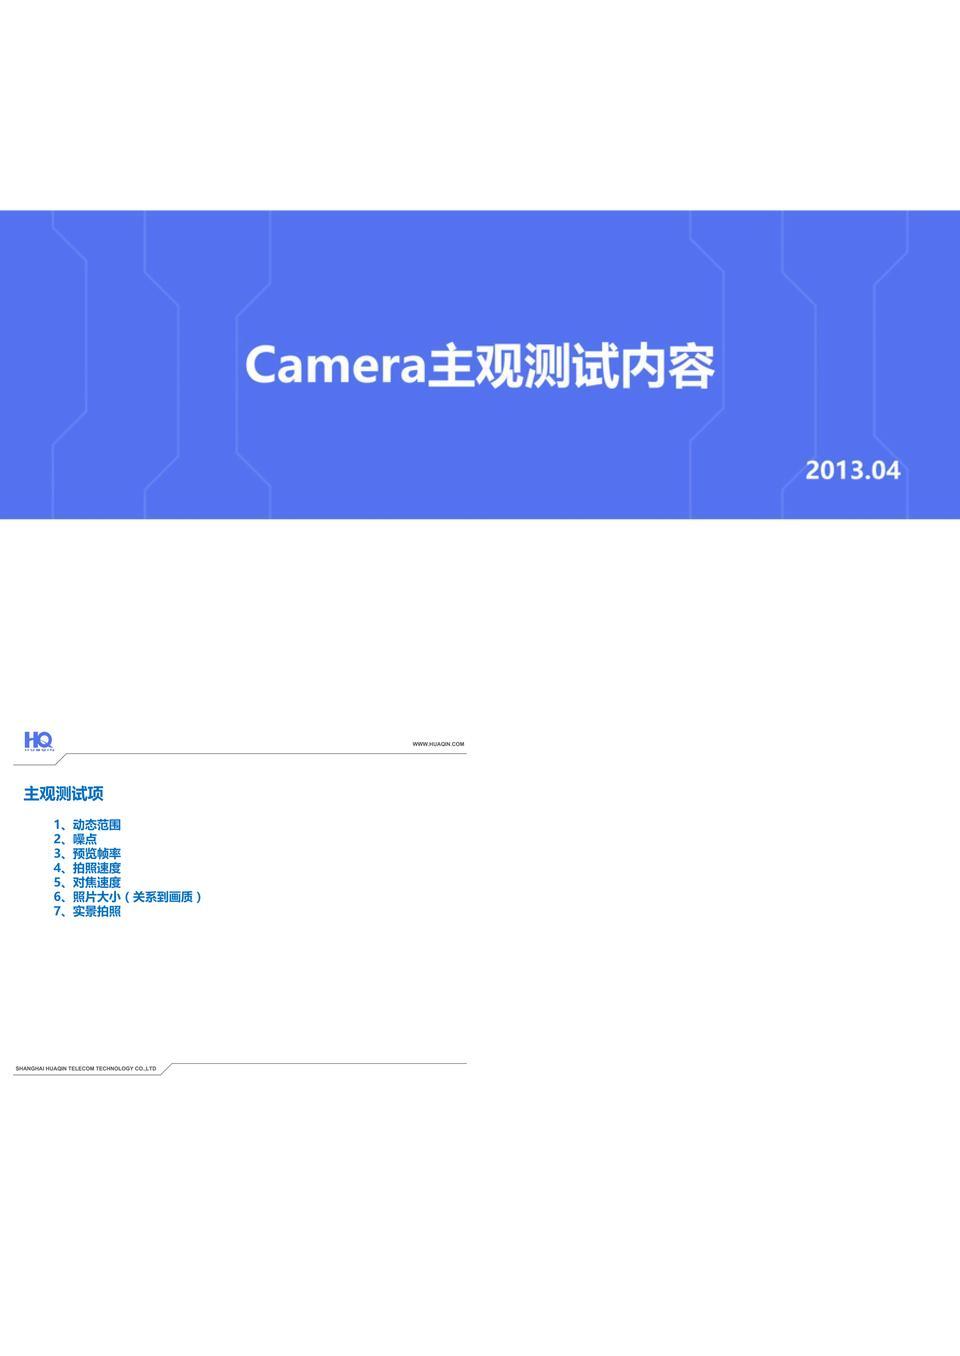 camera主观测试内容.ppt